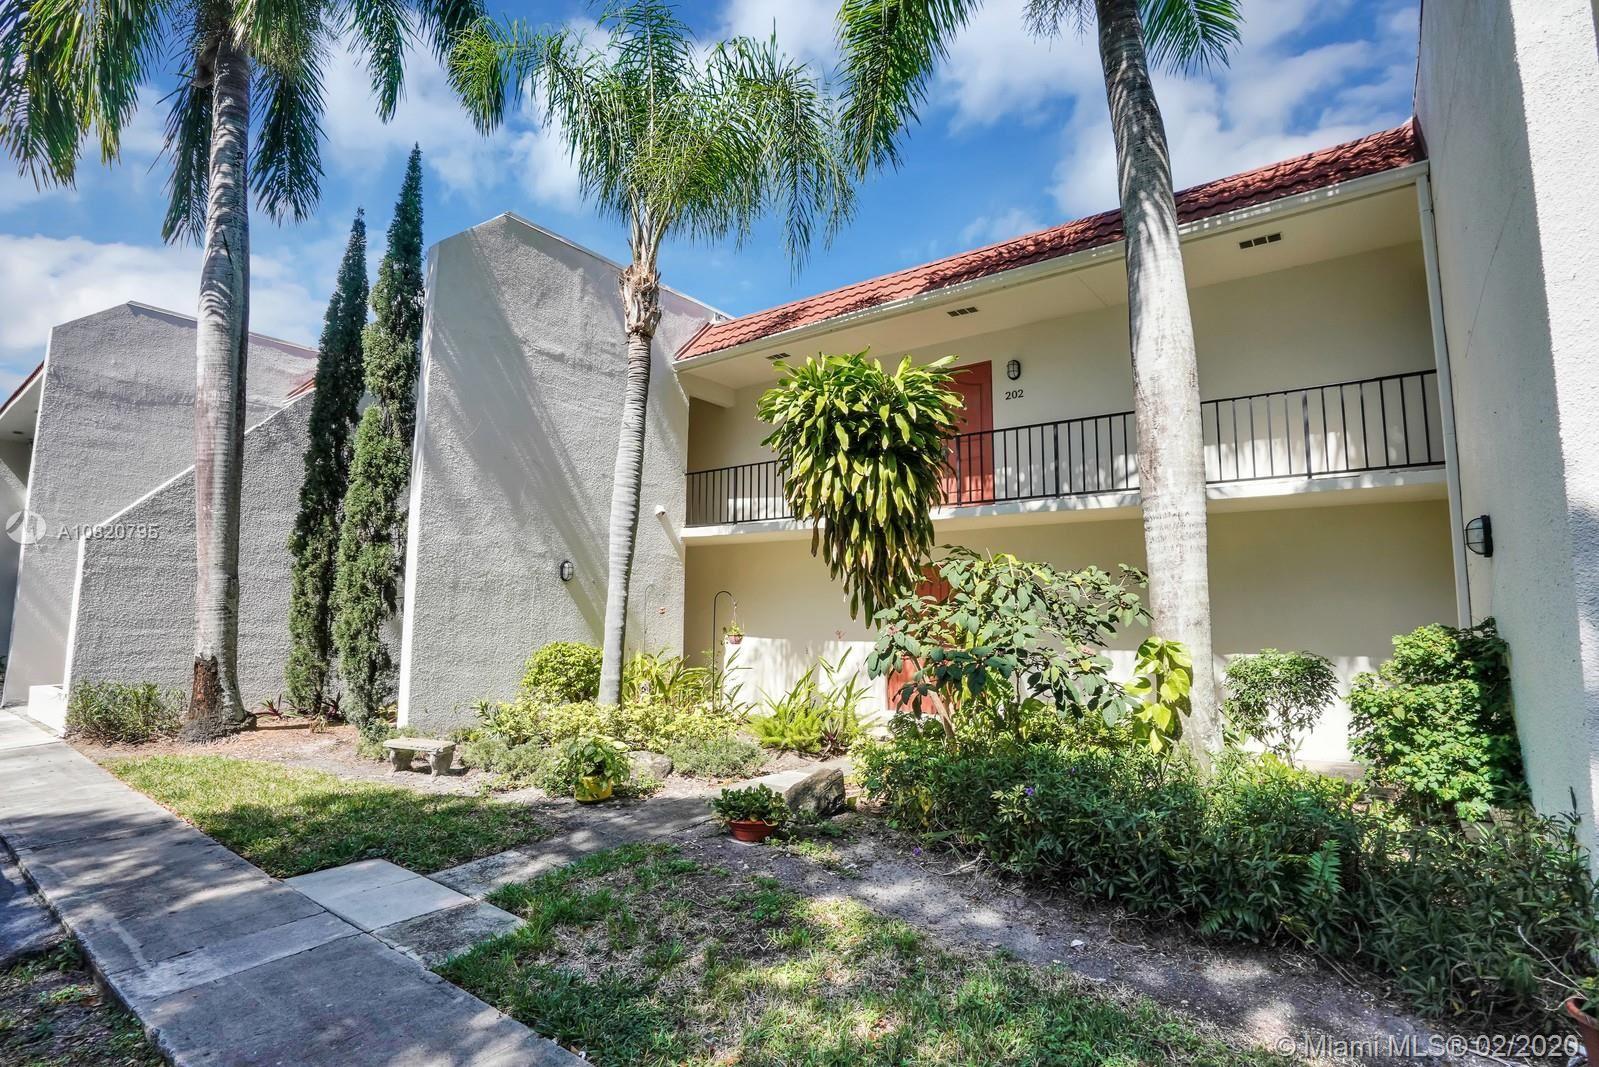 1639 Embassy Dr #202, West Palm Beach, FL 33401 - #: A10820795